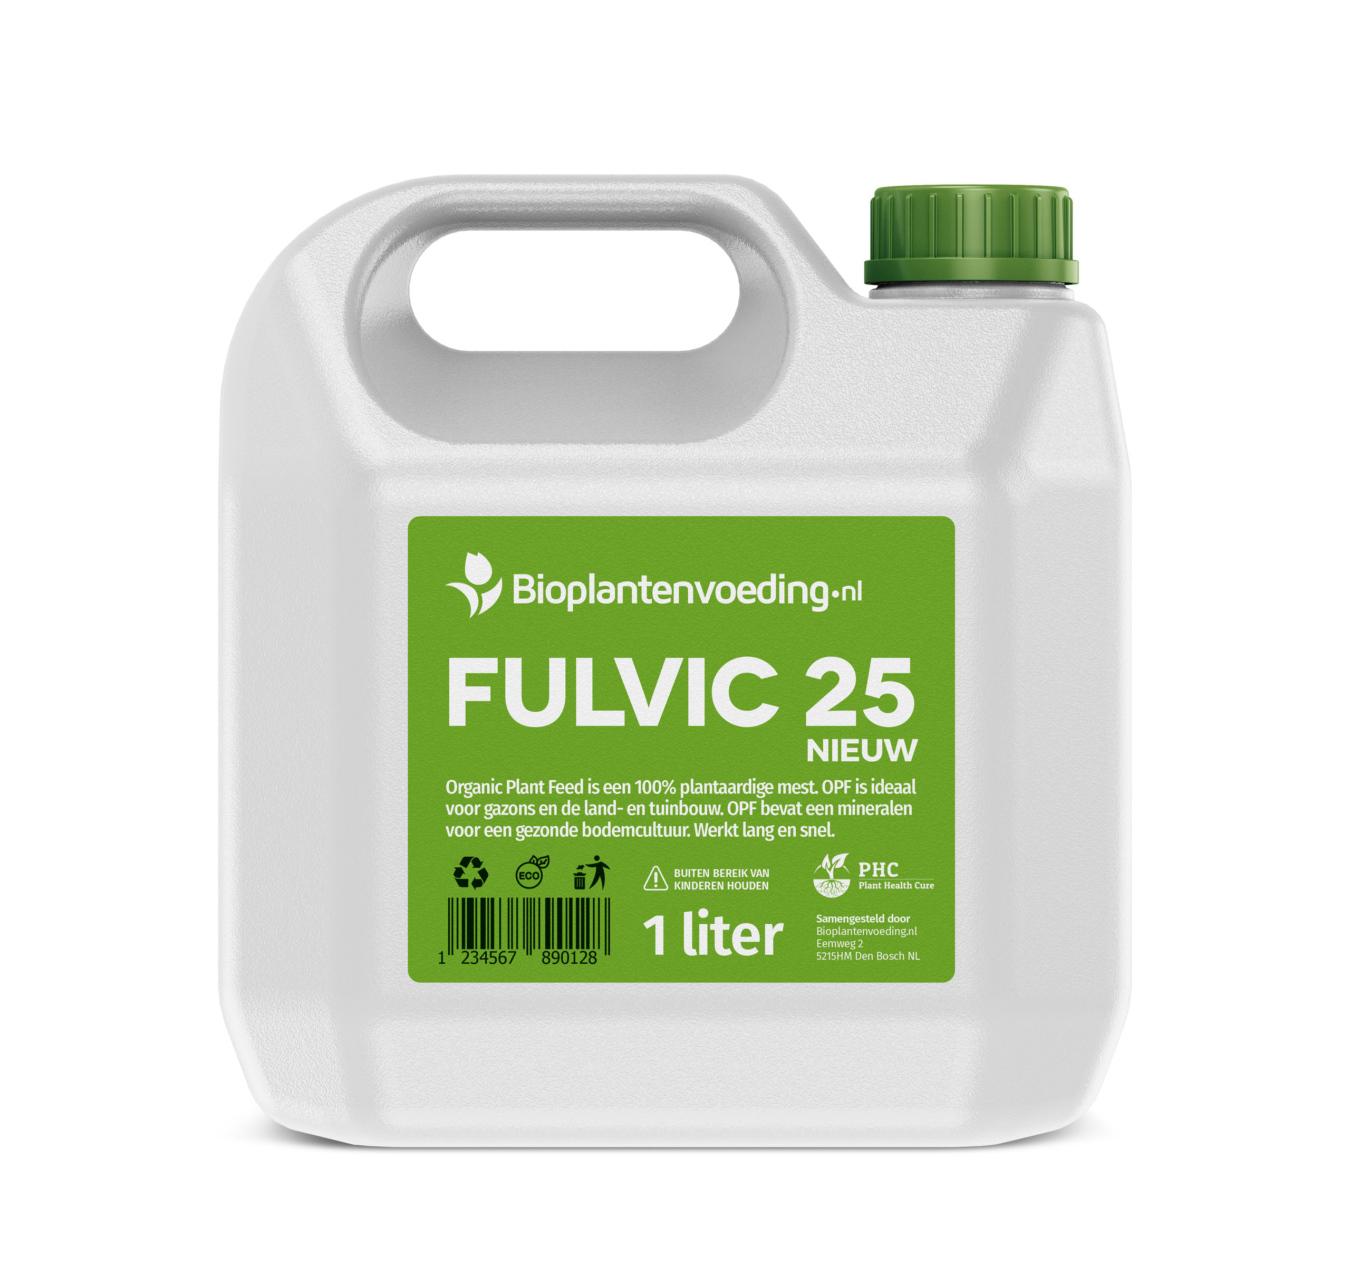 Koop Fulvic [25 New]